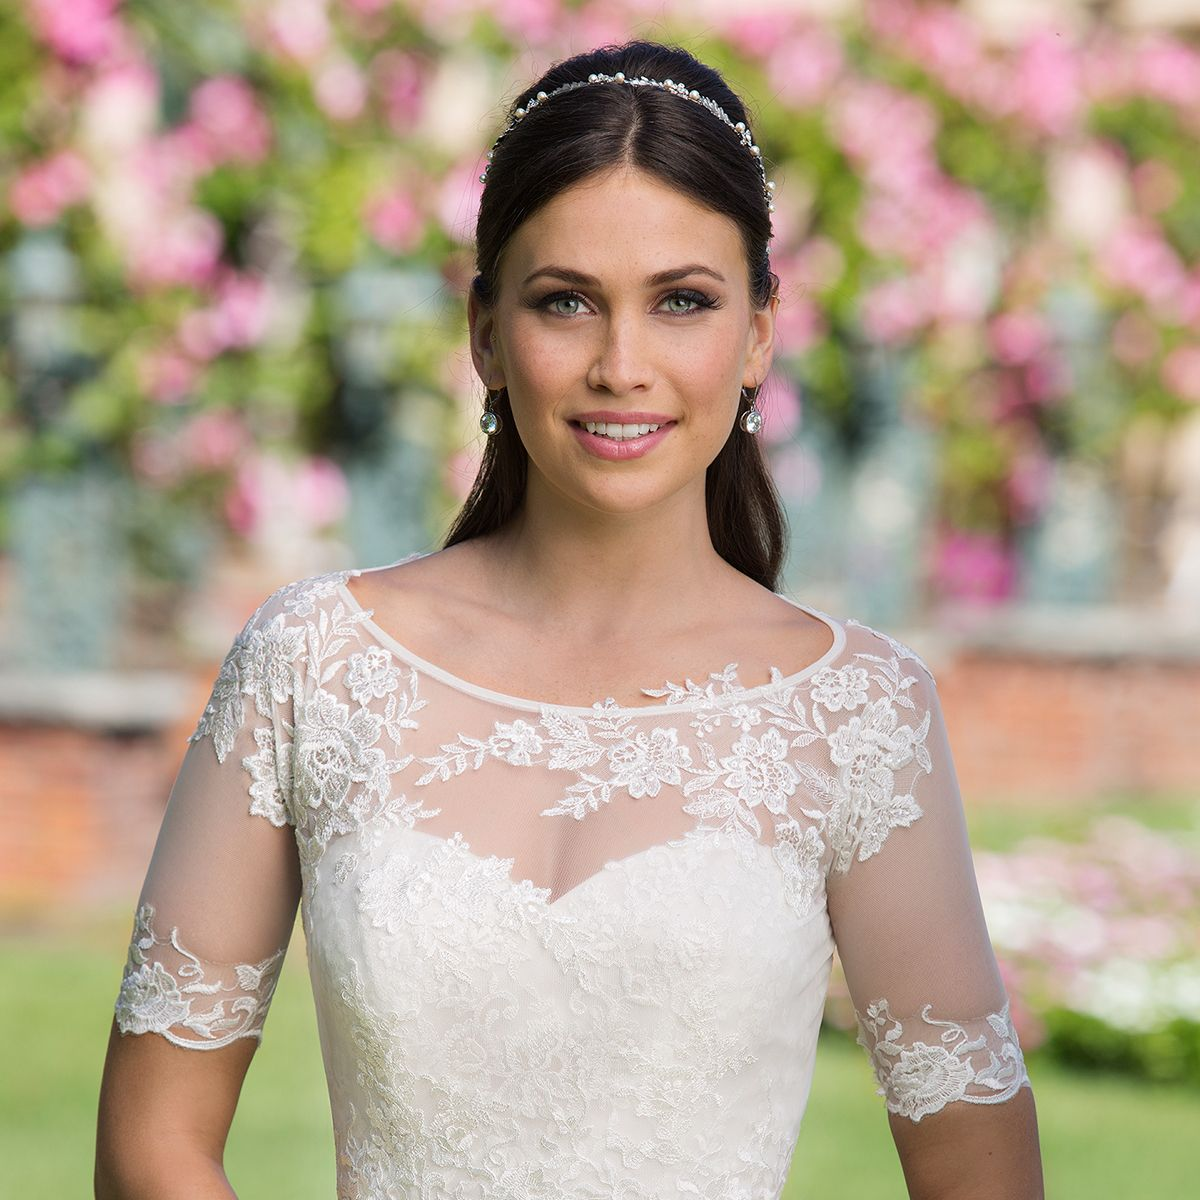 Image result for tulle bridal jacket | Wedding Ideas | Pinterest ...